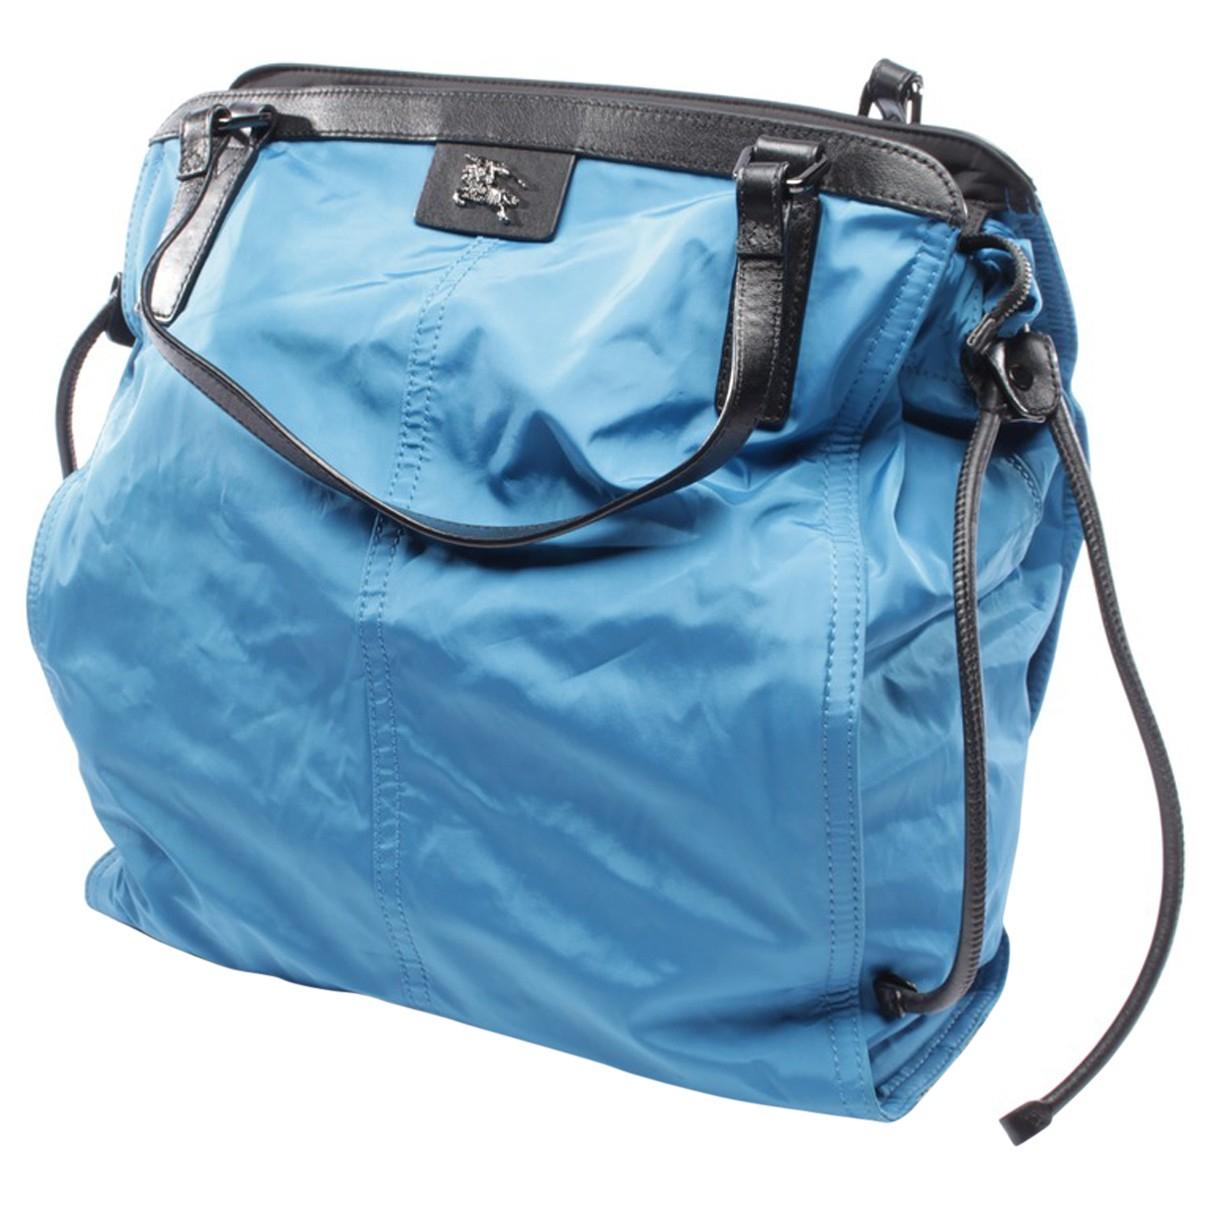 Burberry \N Handtasche in  Blau Polyester